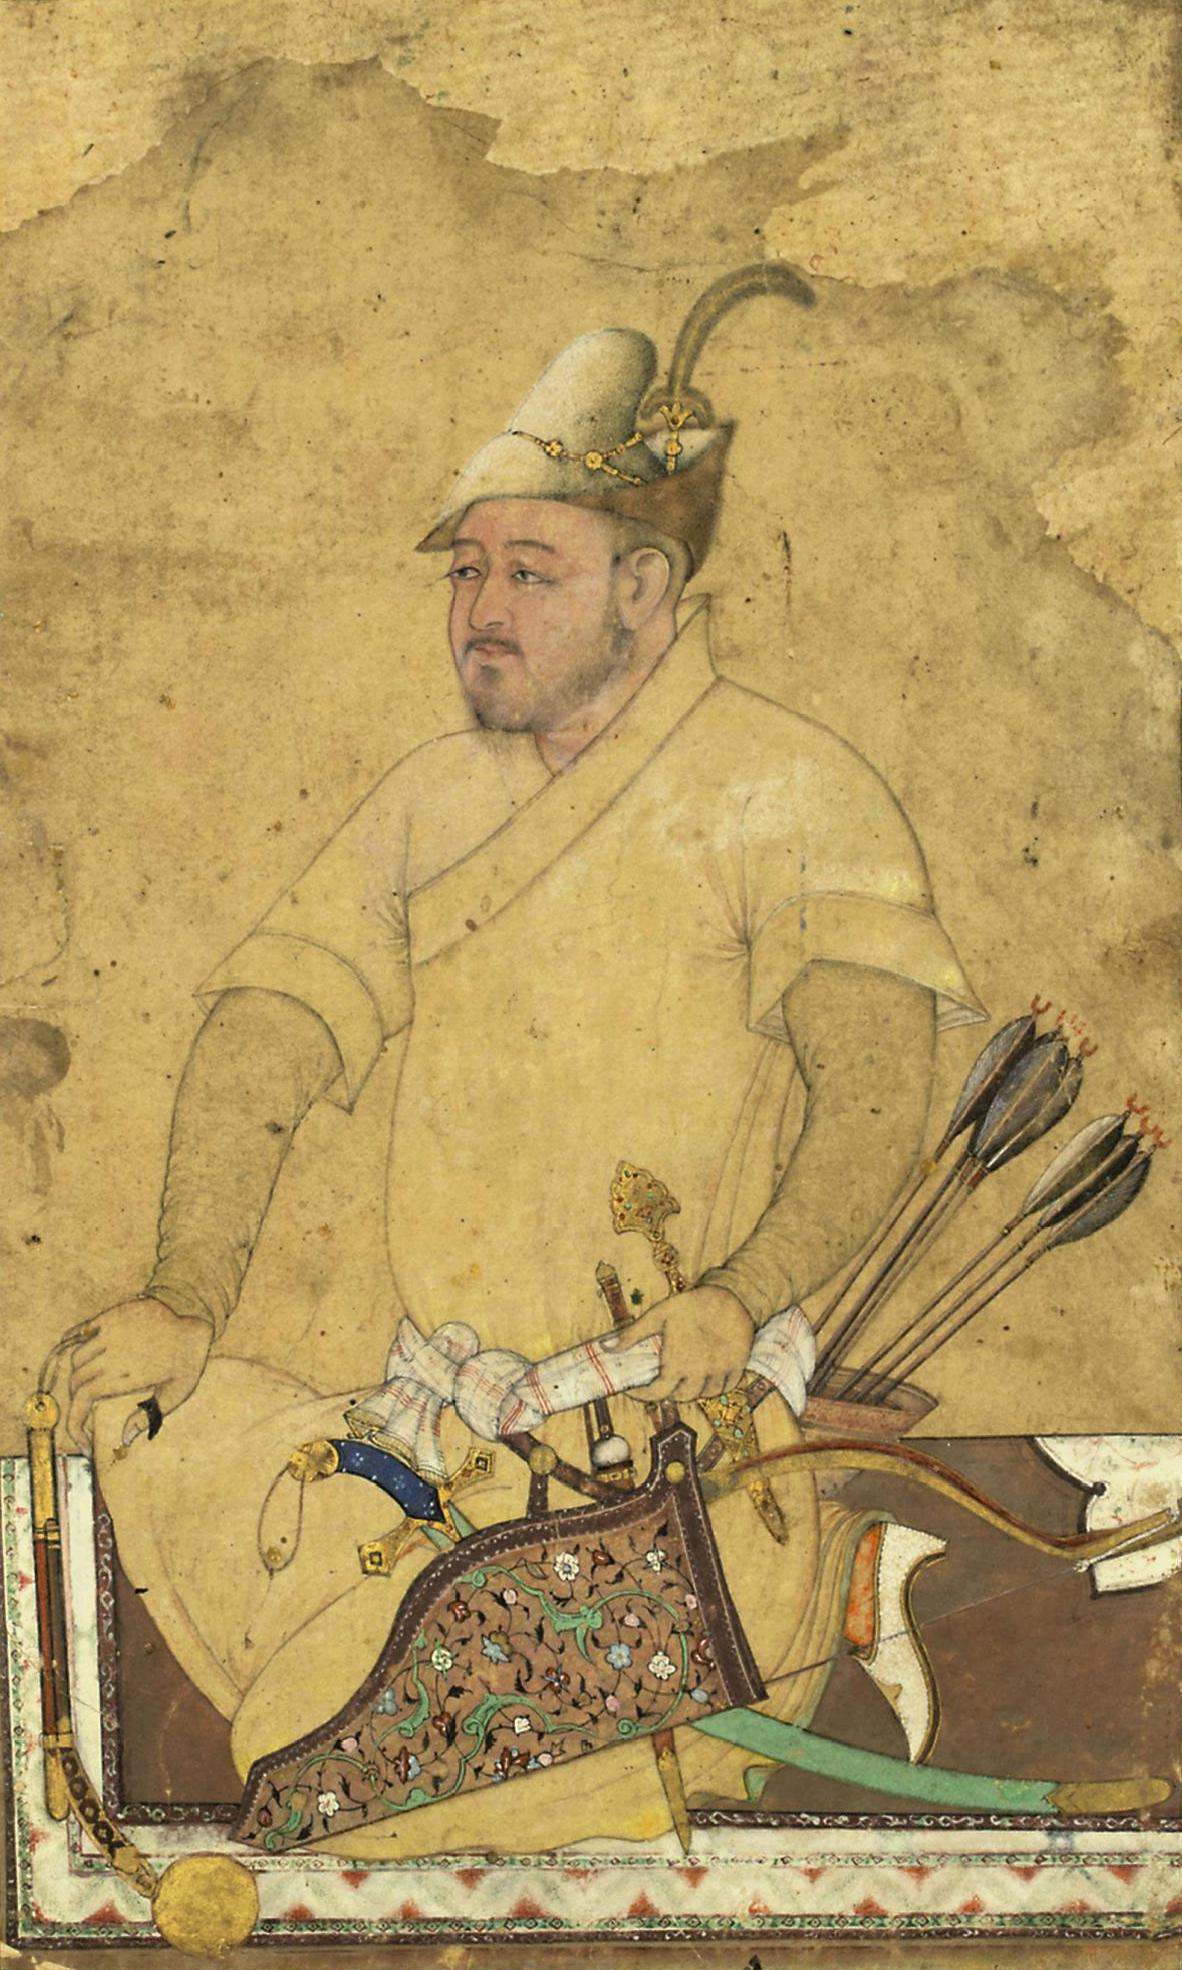 A_heavily_armed_Uzbek,_Safavid_Iran,_mid